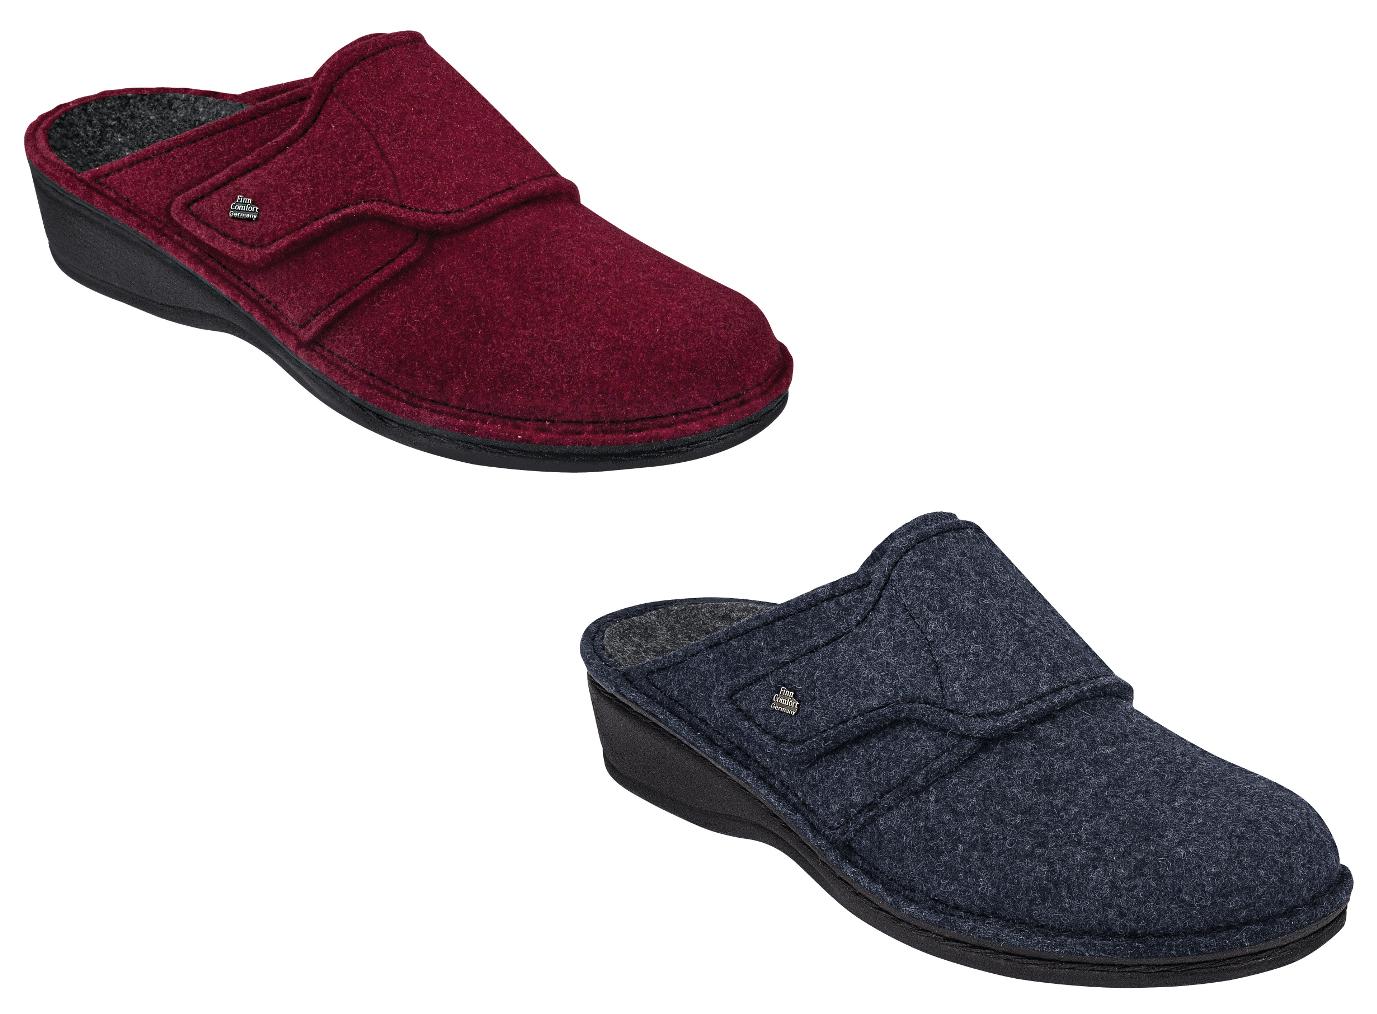 Damen Sandaletten Bast Keilabsatz High Heels Sommer Wedges 826199 Trendy Neu